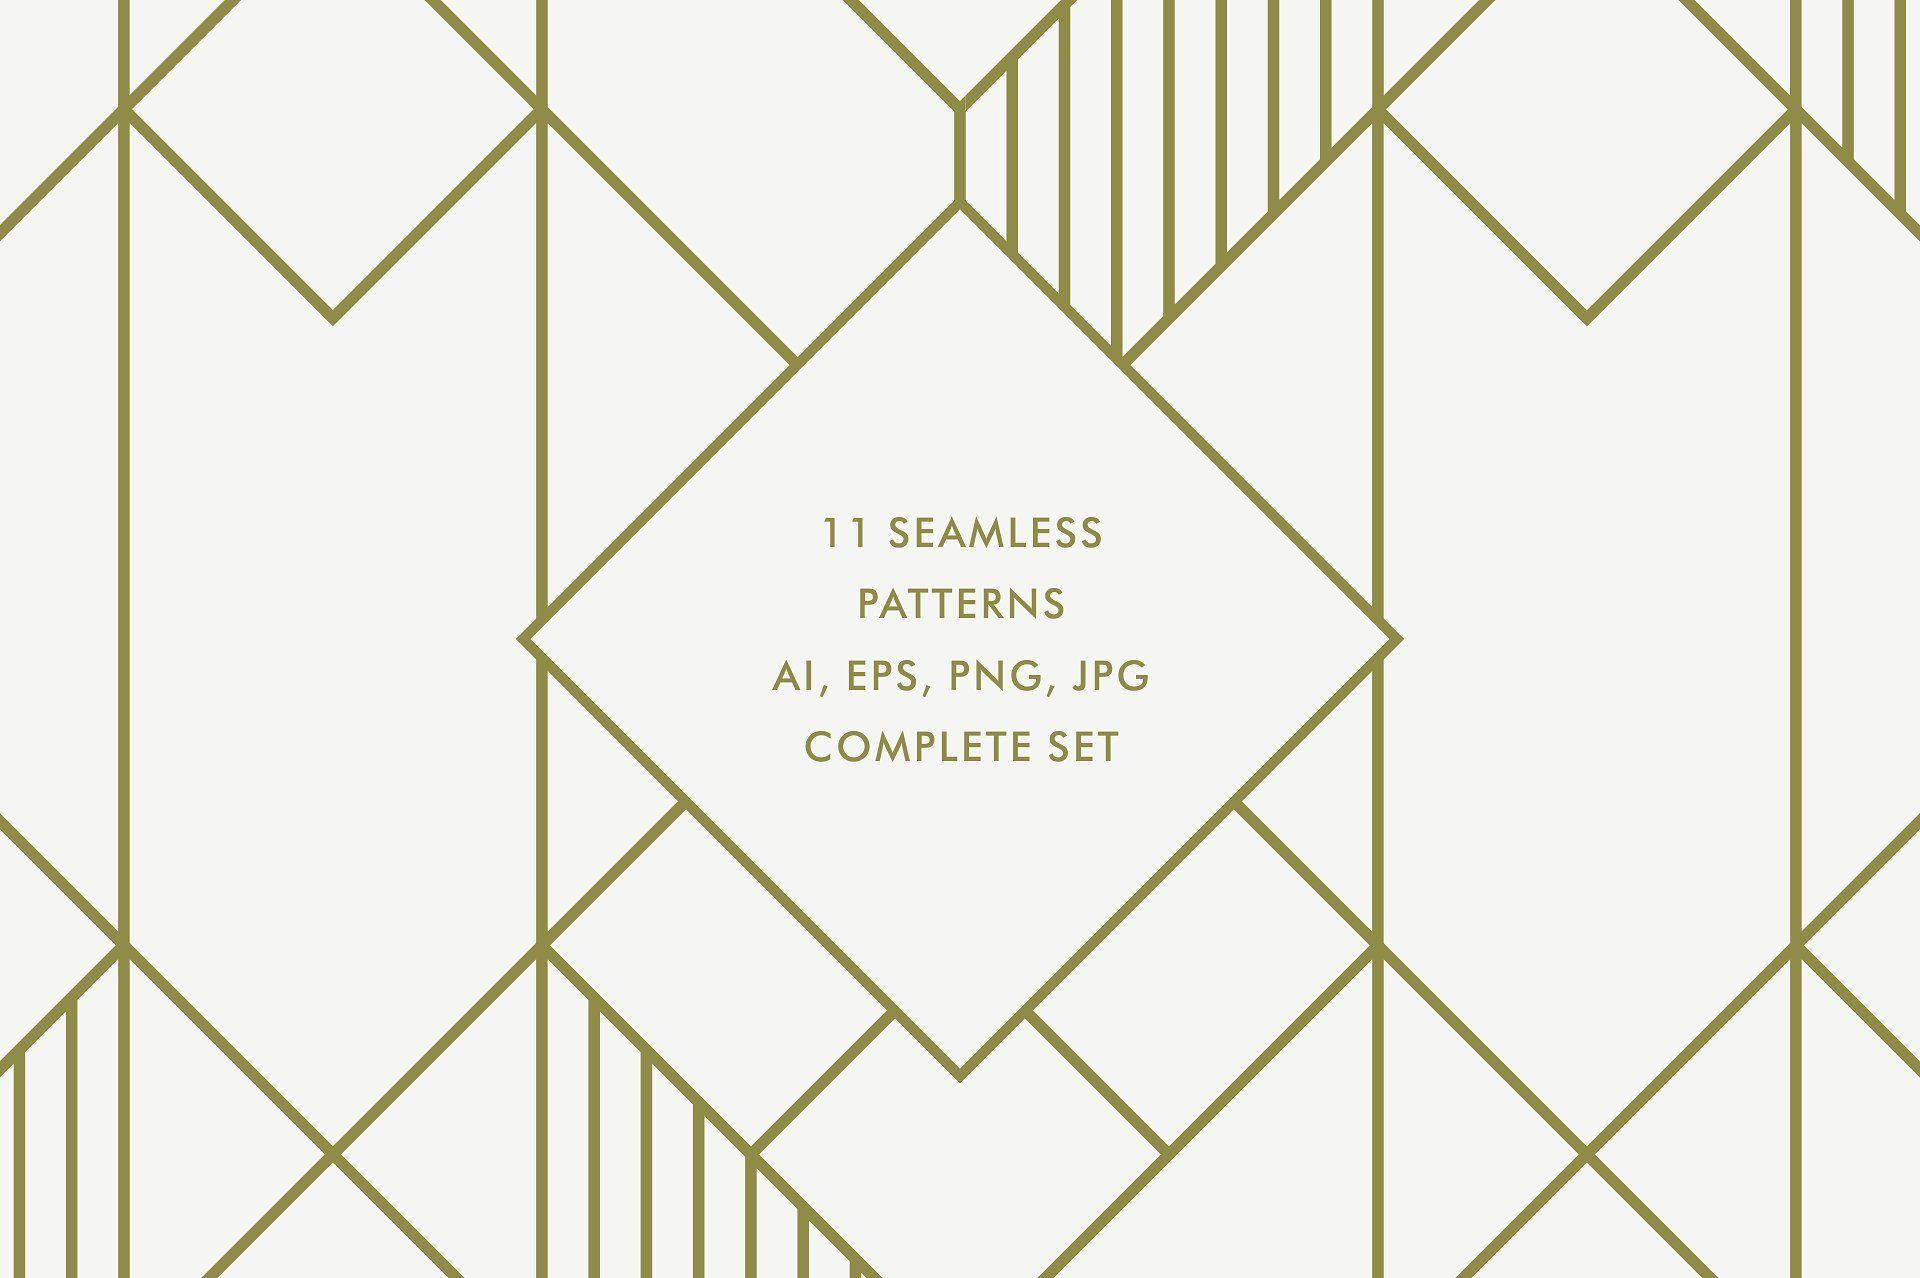 Geometric Art Deco Patterns V3 designDesignedeasyclassic